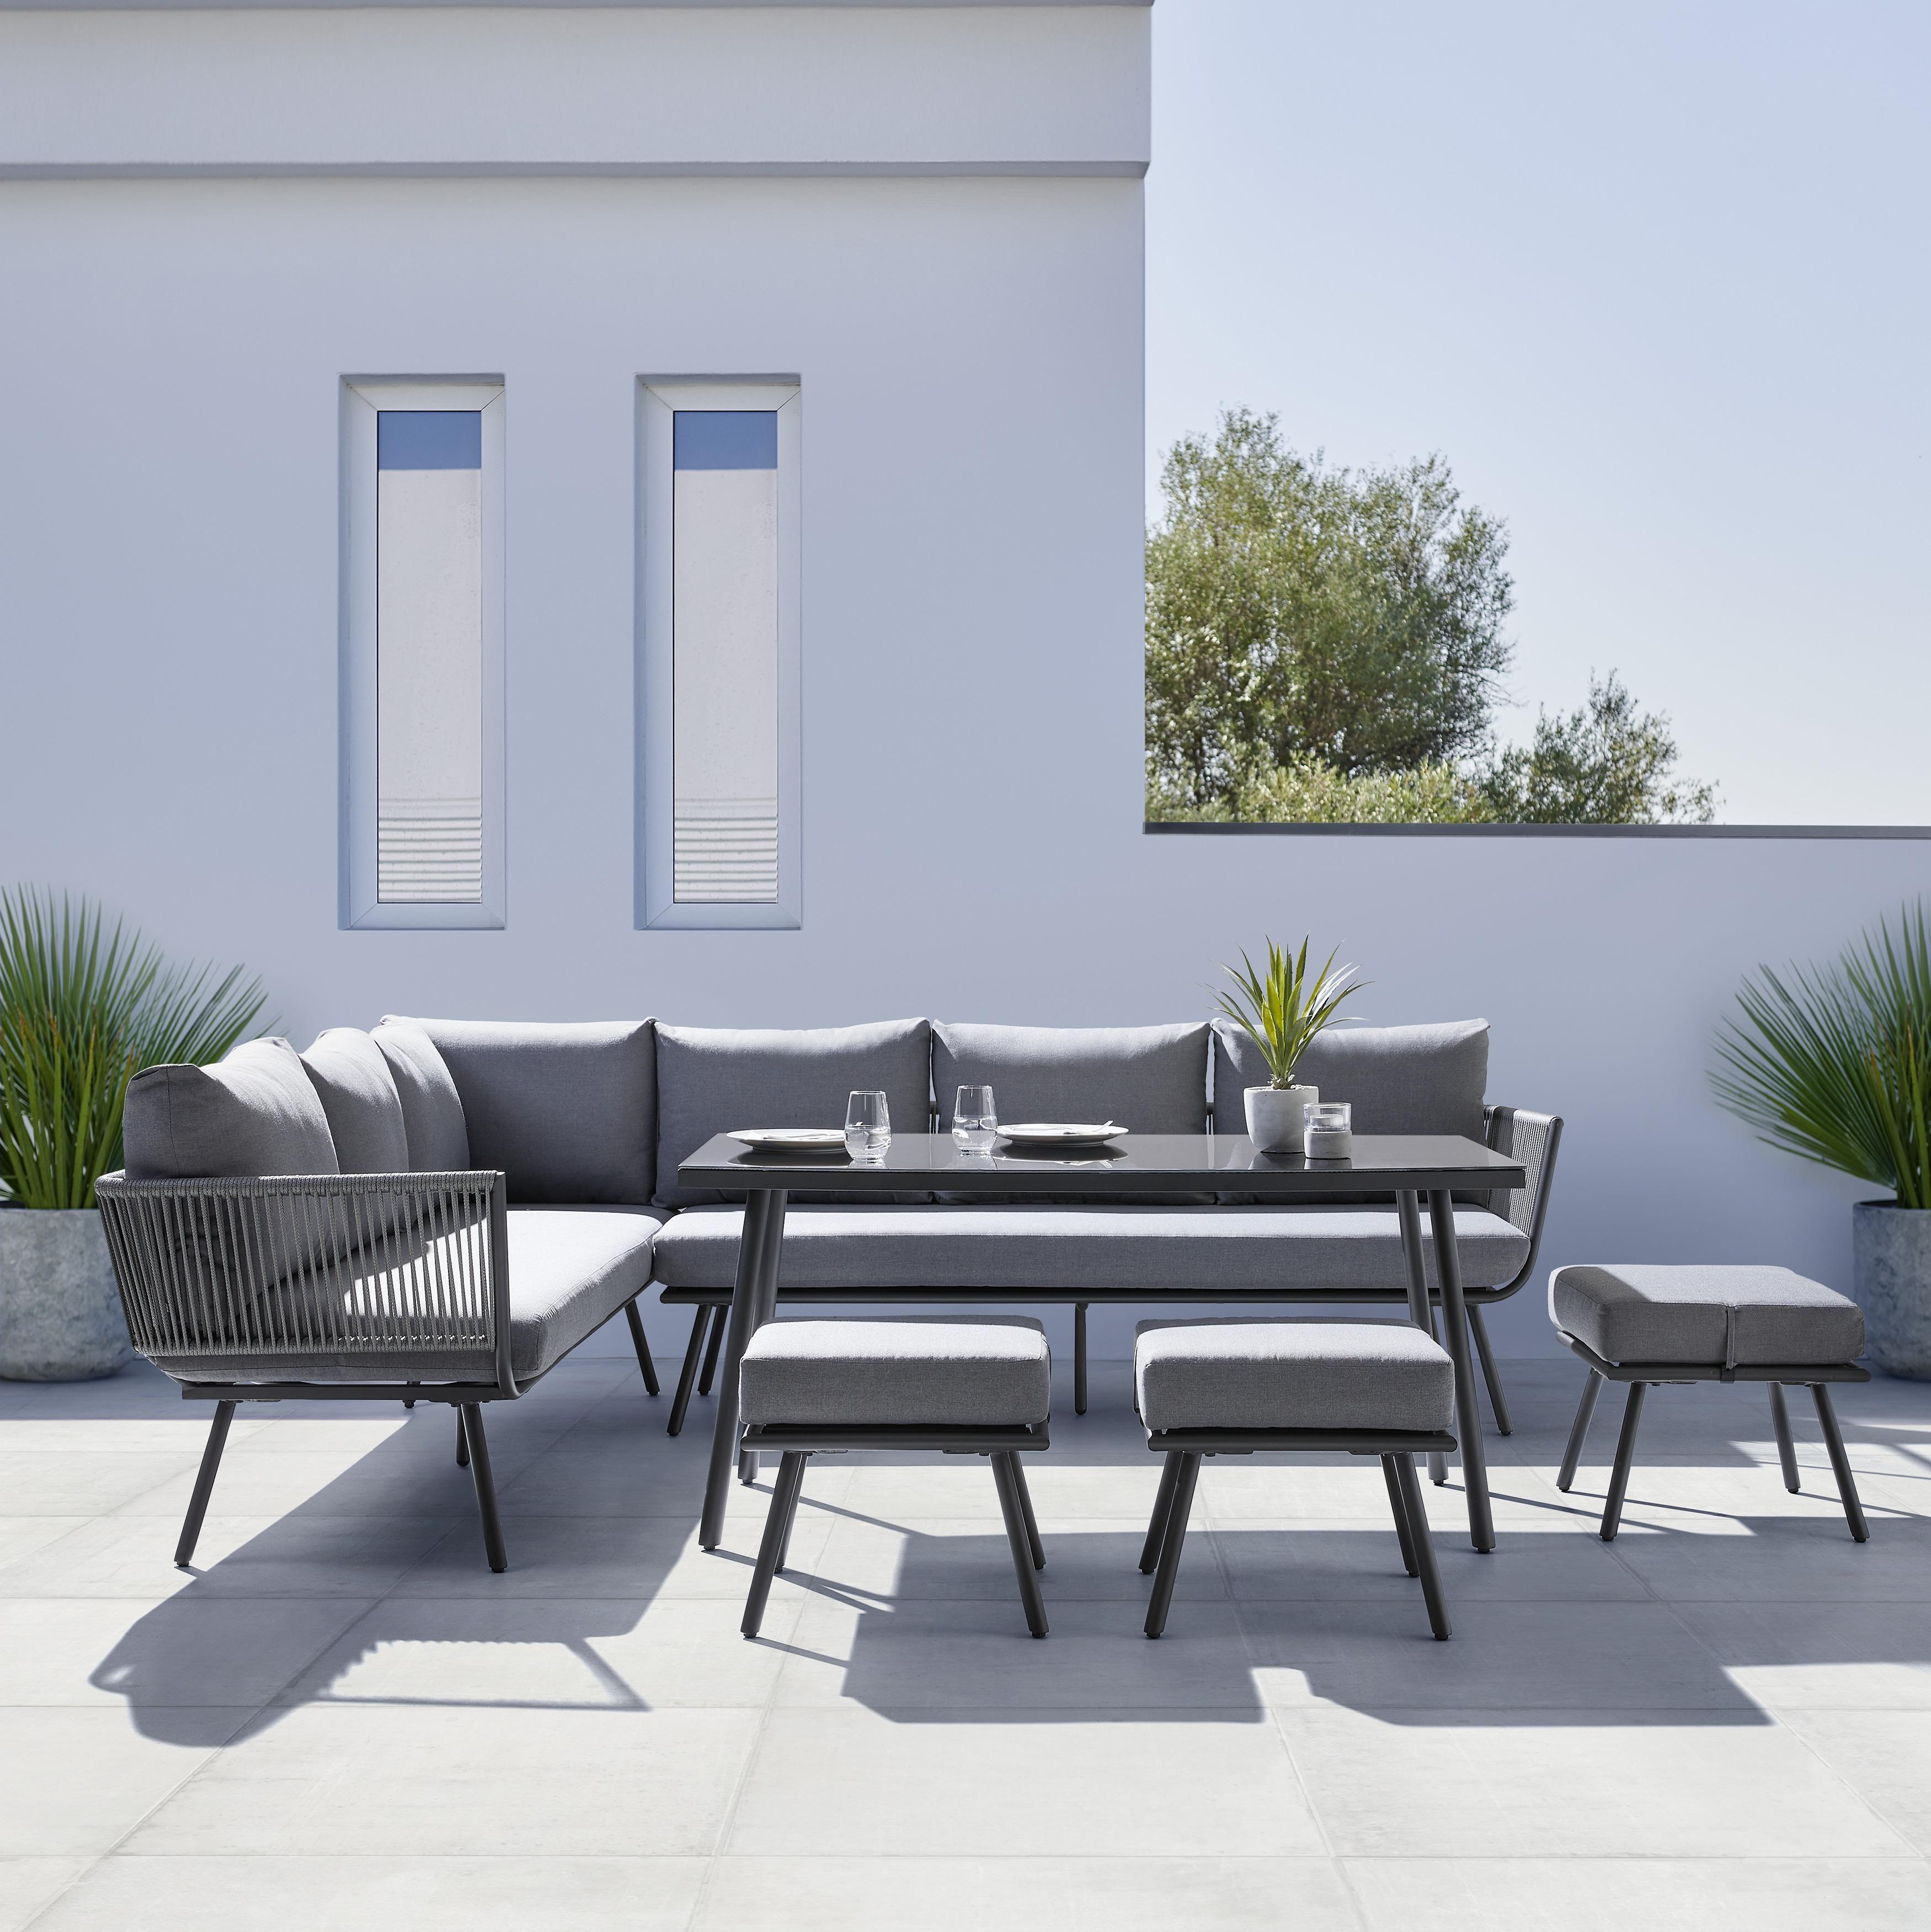 Loungegarnitur In Grau Dunkelgrau Online Bestellen Lounge Garnitur Lounge Aussenmobel